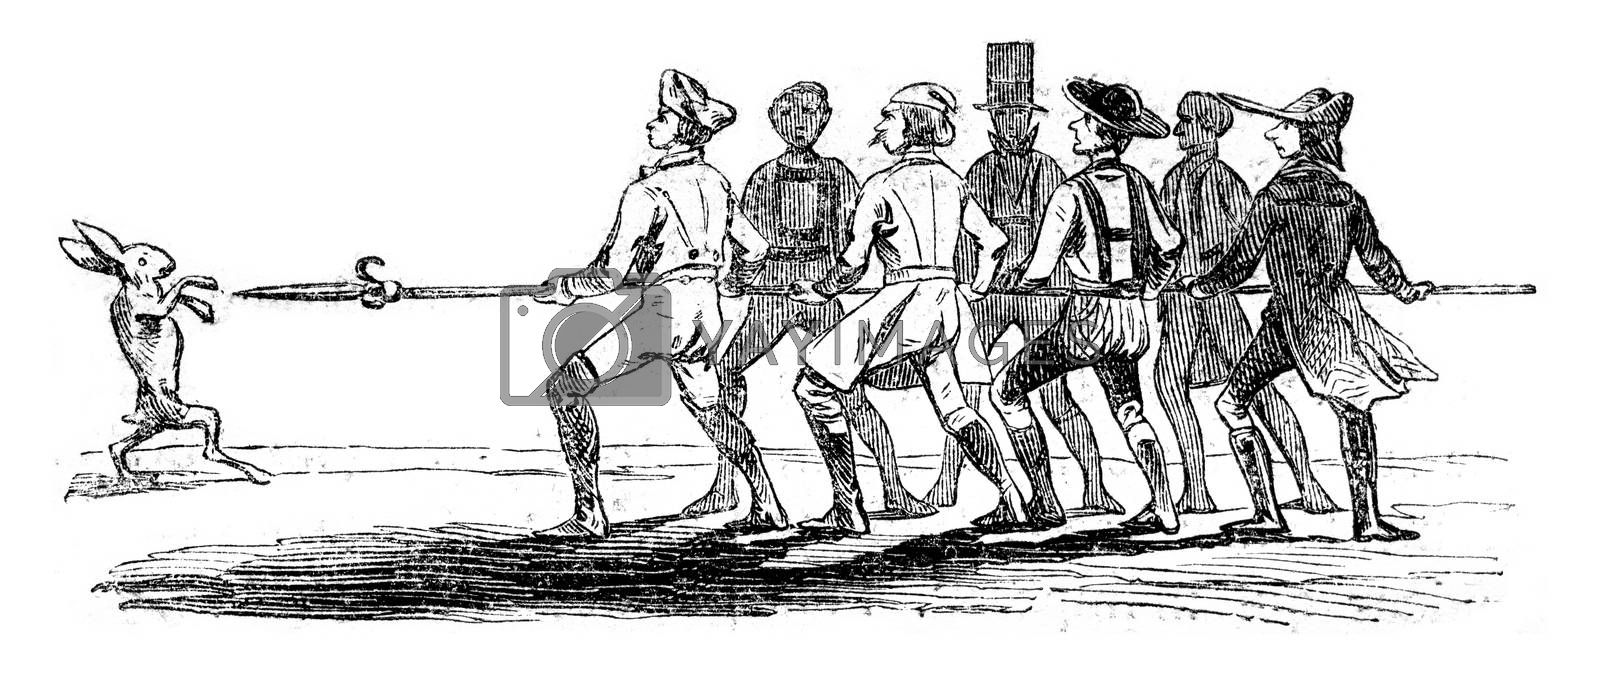 The seven Swabians, vintage engraved illustration. Magasin Pittoresque 1852.